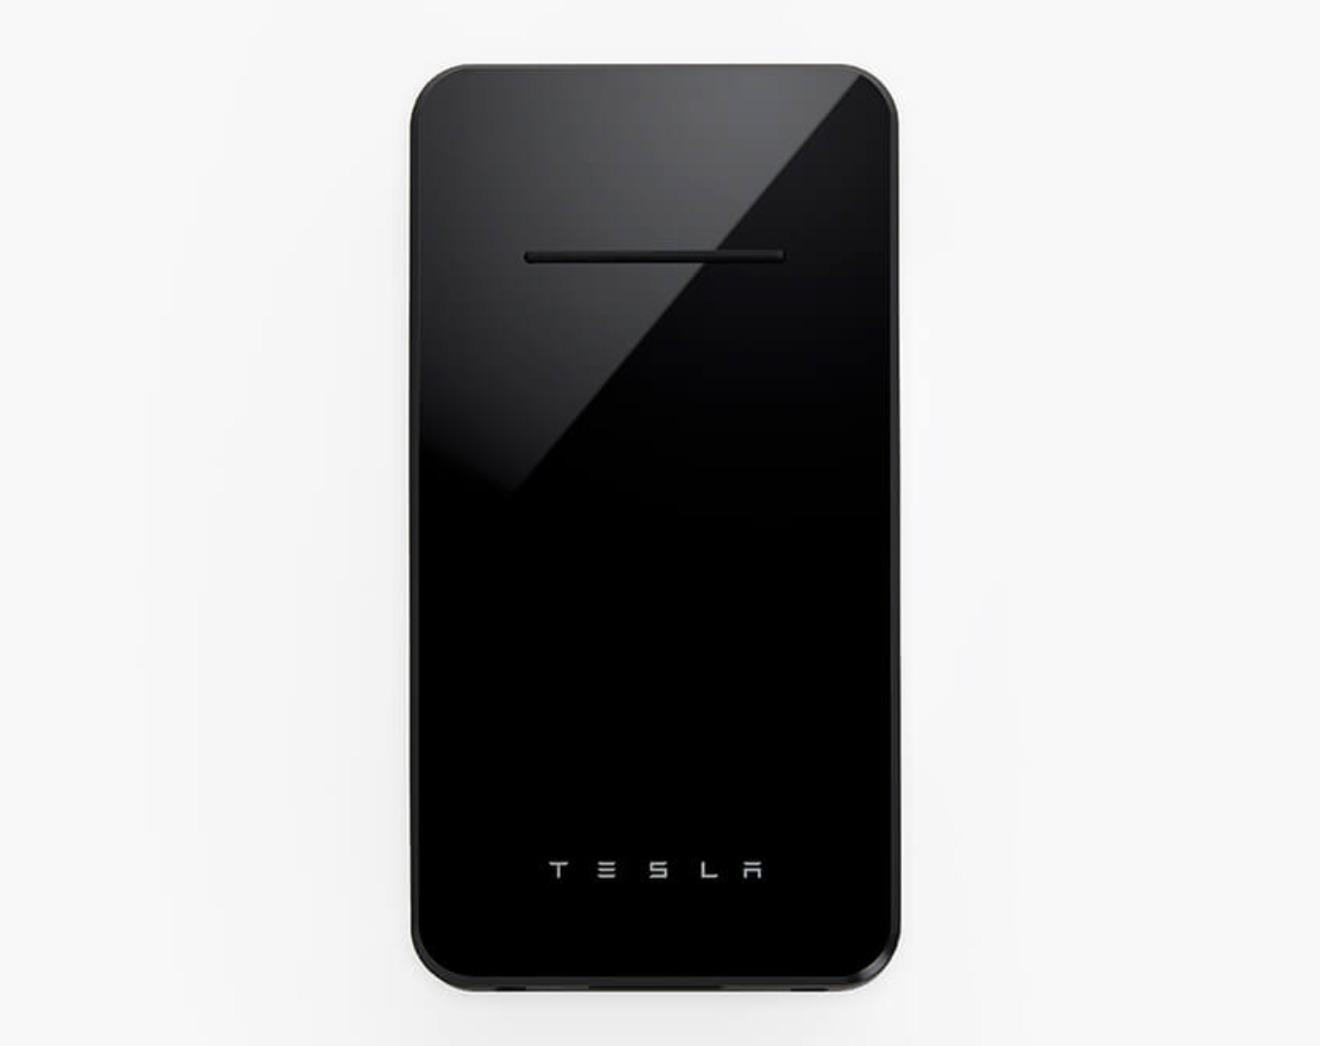 Tesla's charger